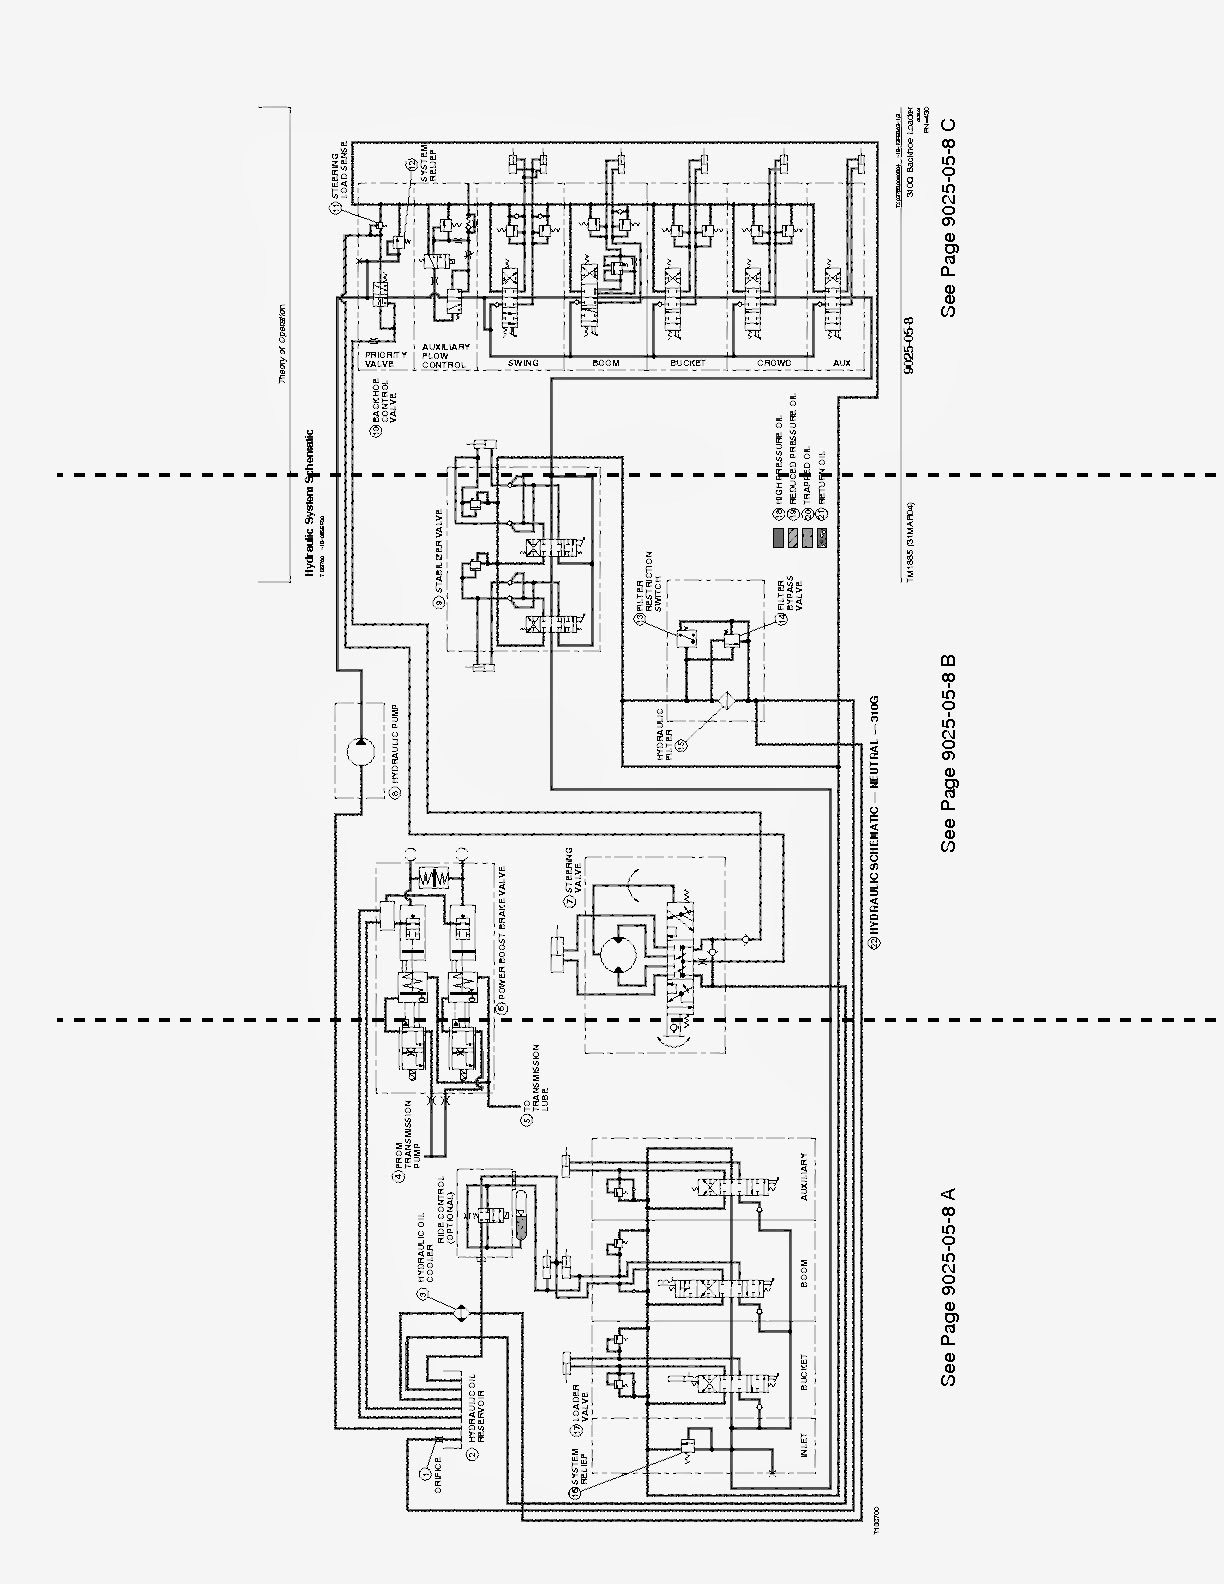 Wiring Diagram Harley Davidson Fatboy Html